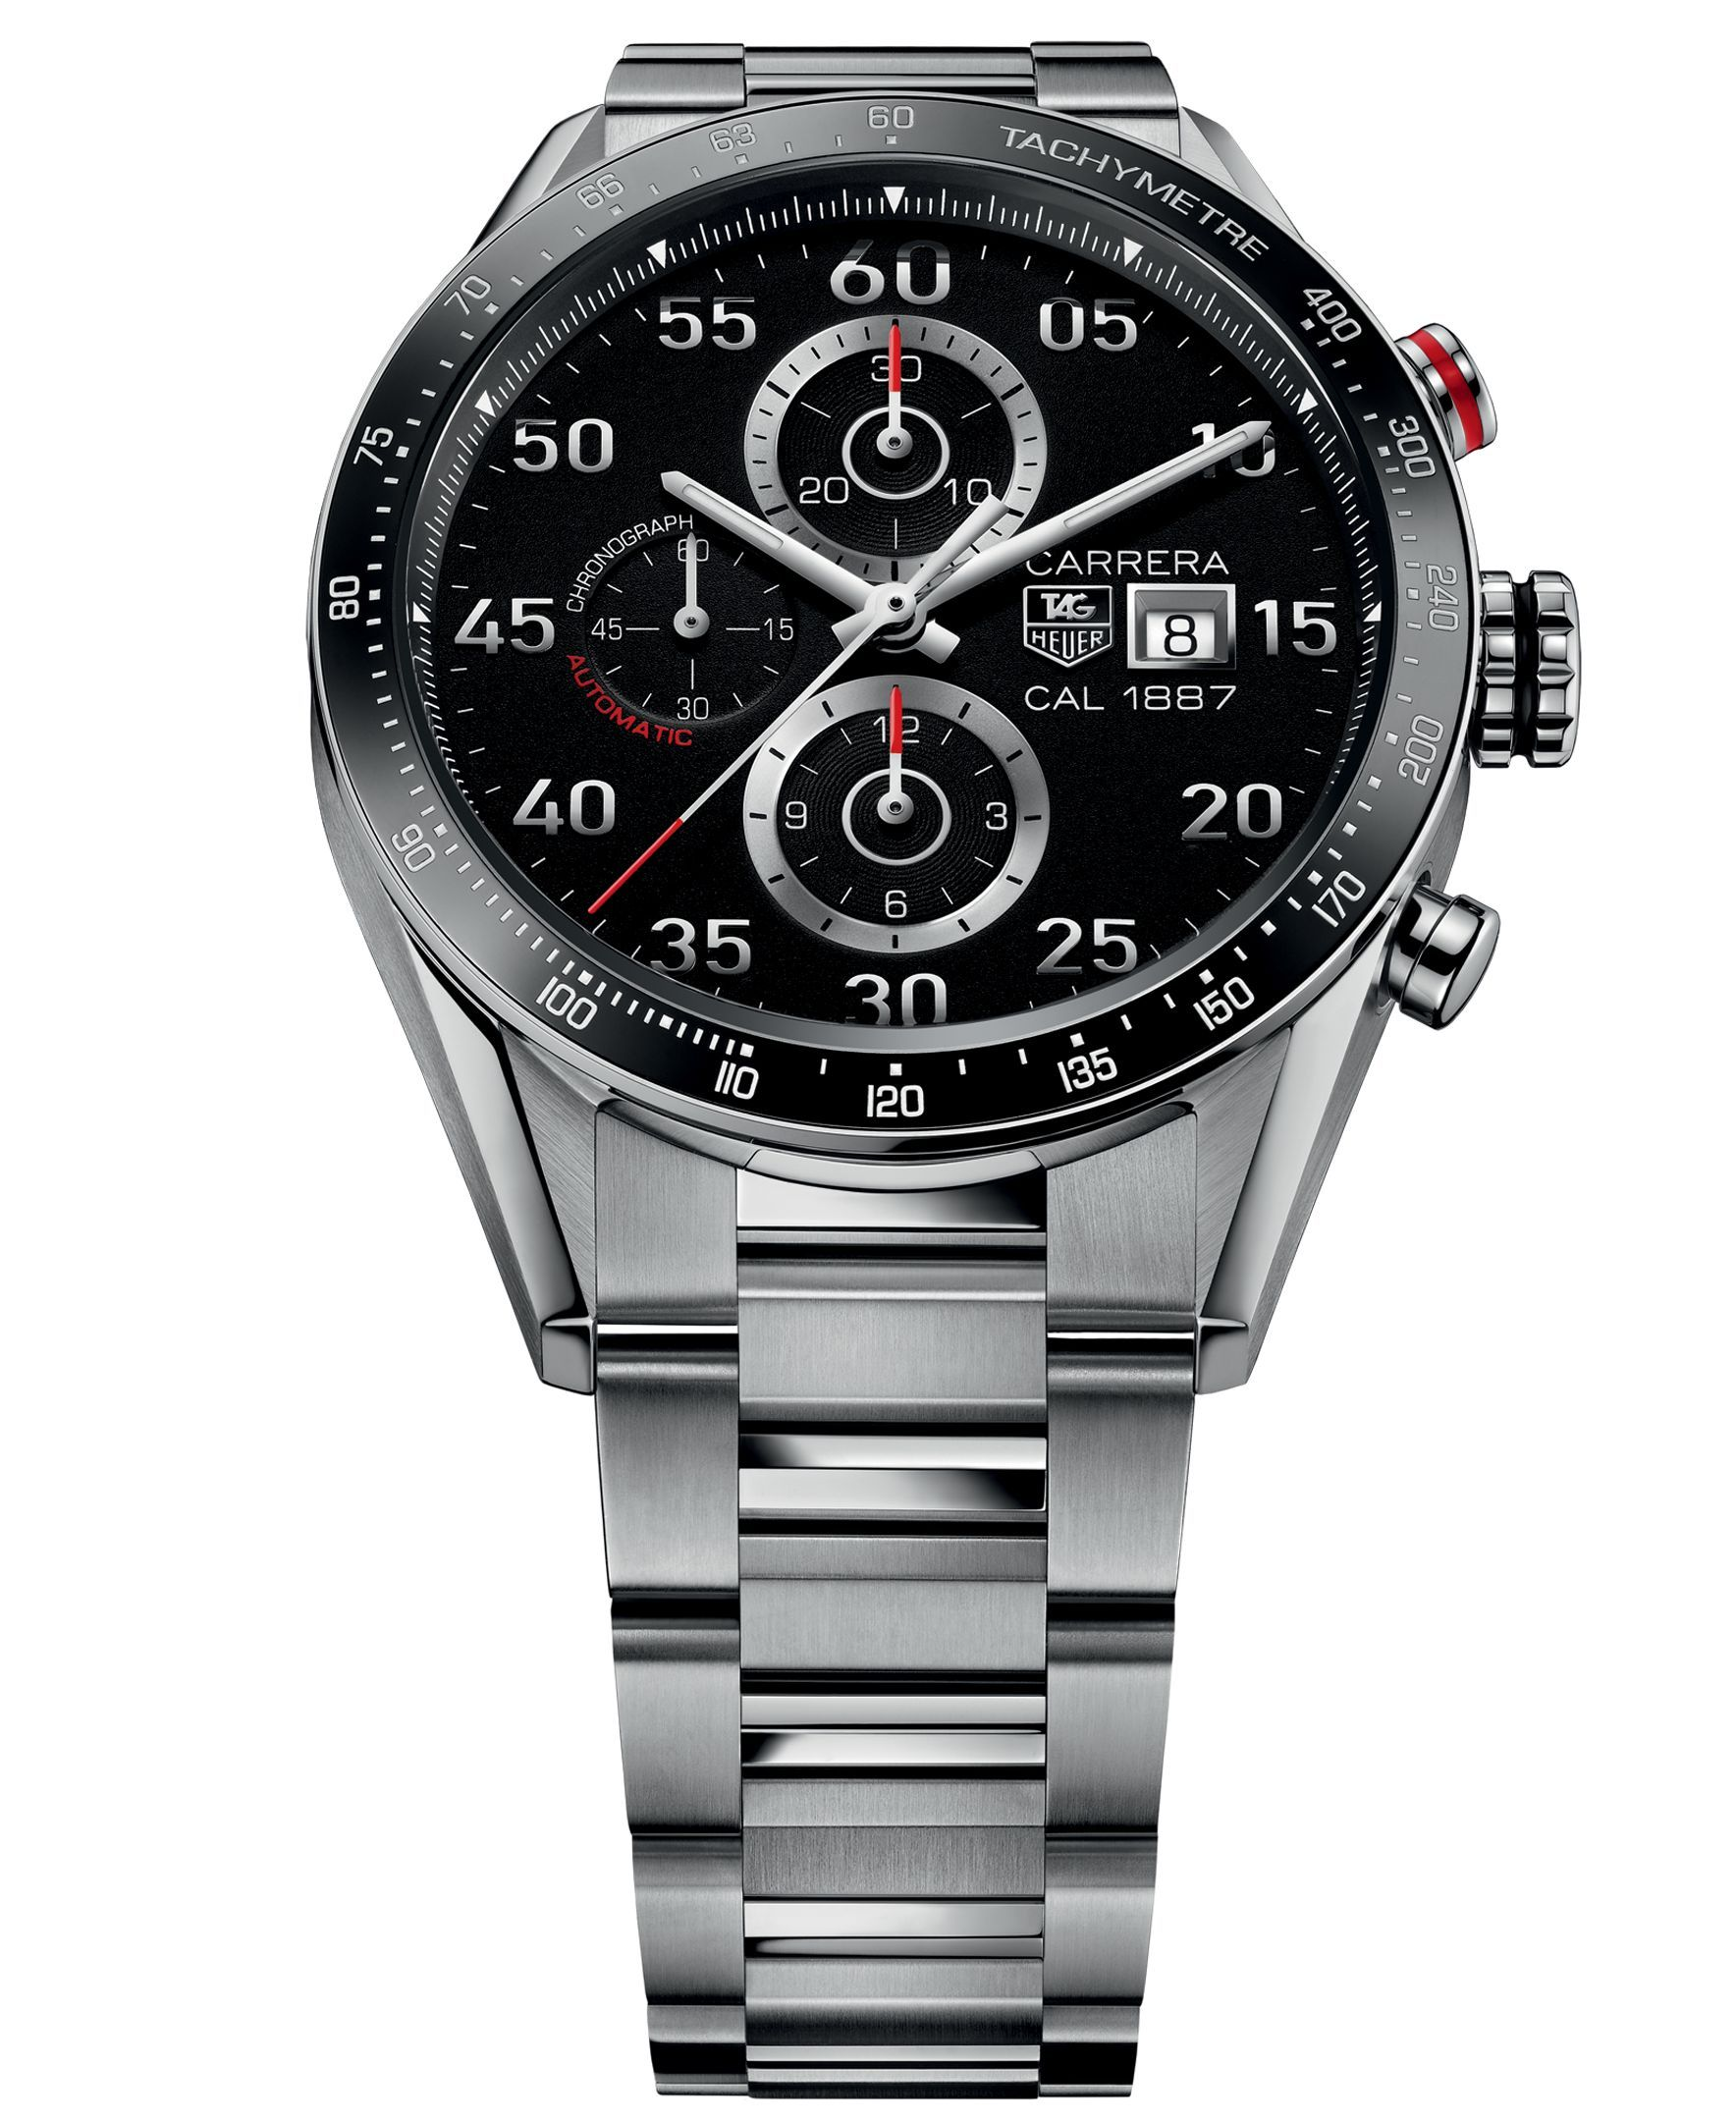 fbcb58ca56f97 Tag Heuer Men s Swiss Automatic Chronograph Carrera 1887 Stainless Steel  Bracelet Watch 43mm CAR2A10.BA0799